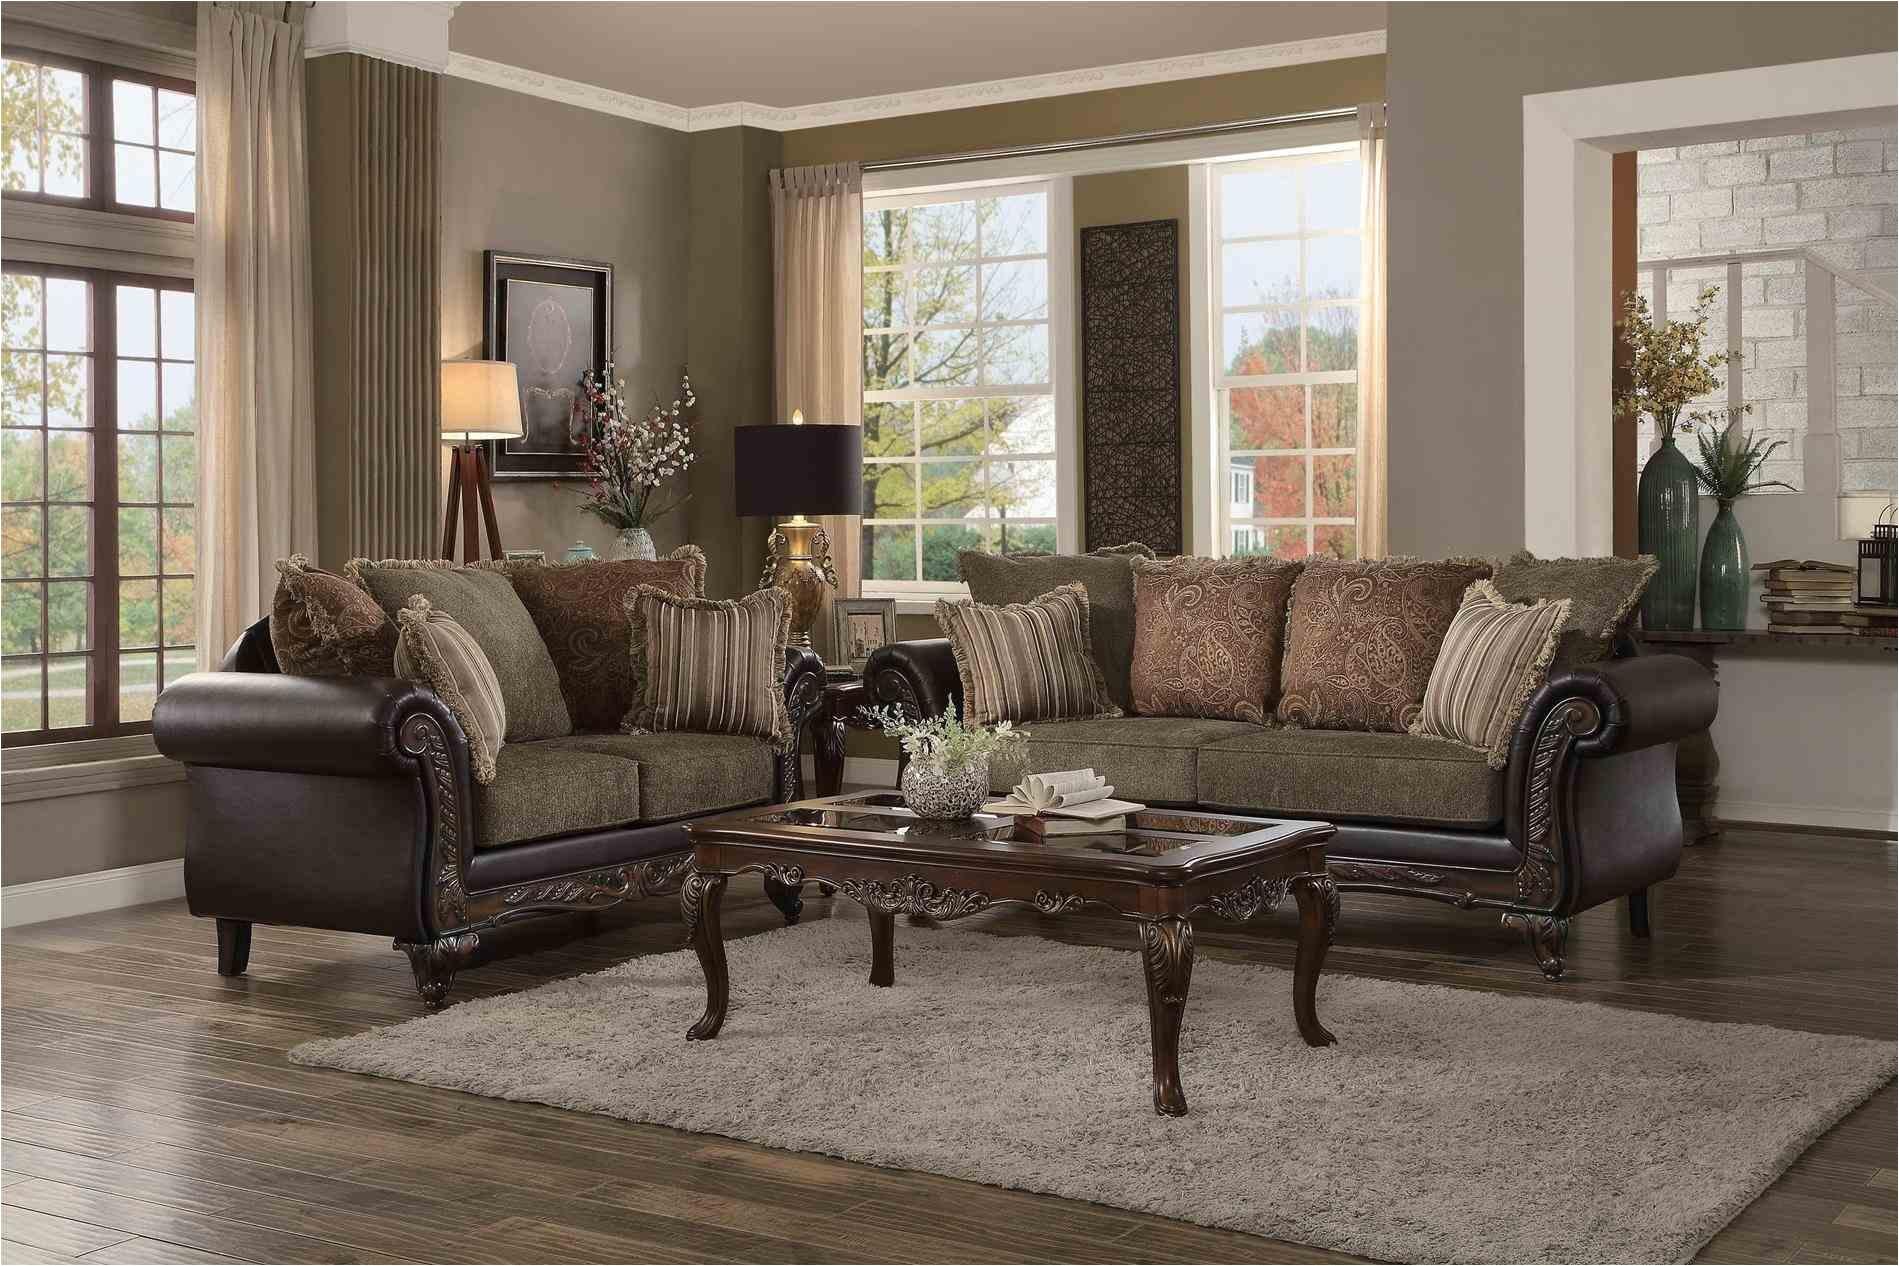 butterworth furniture petersburg va